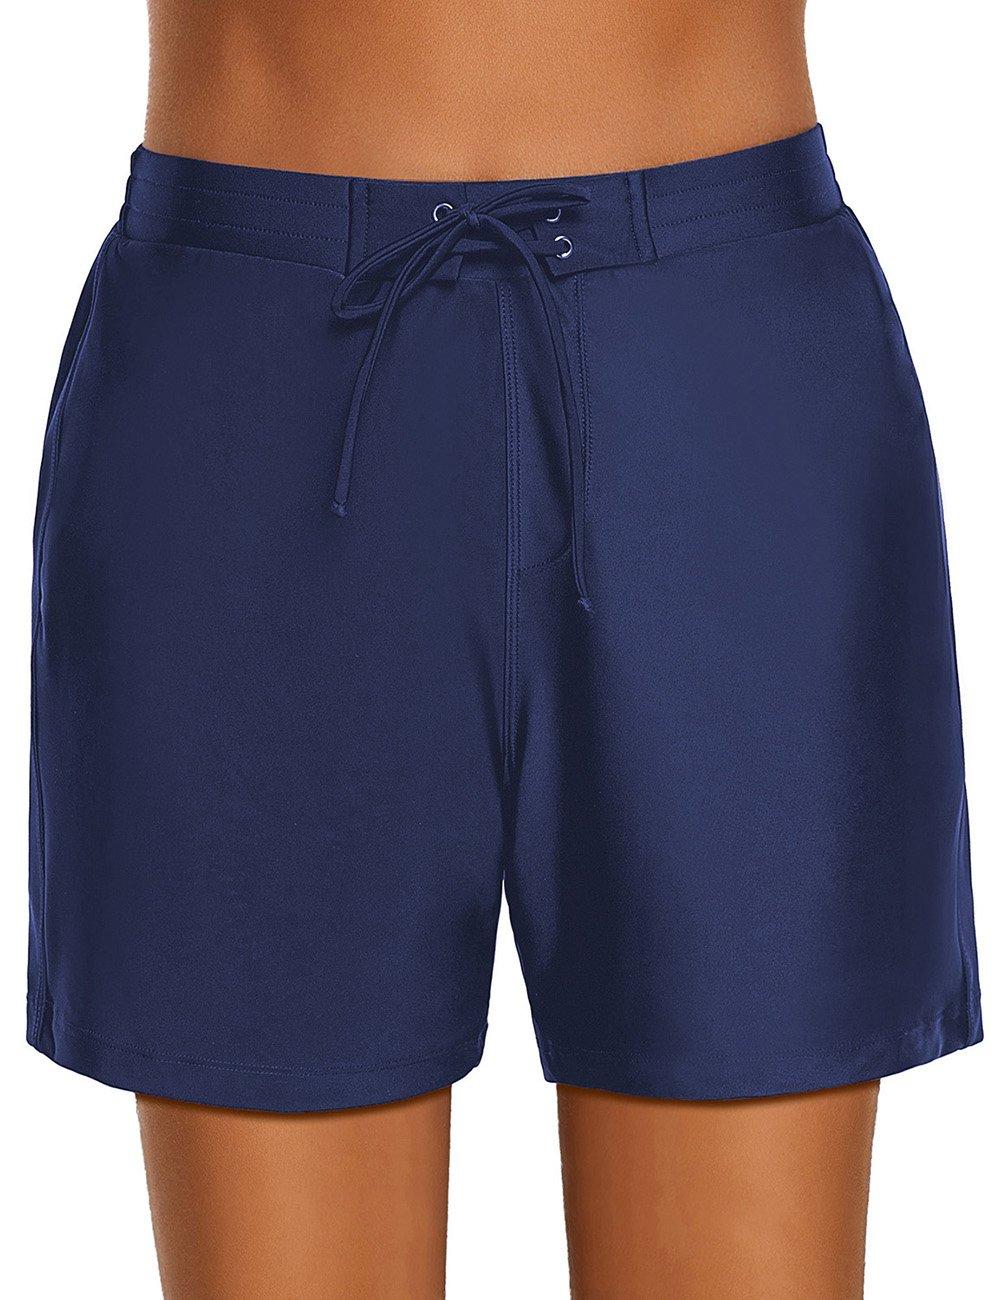 Utyful Women's Navy Blue Casual Lace up Elastic Waist Swimsuit Bottom Beach Board Shorts Size L